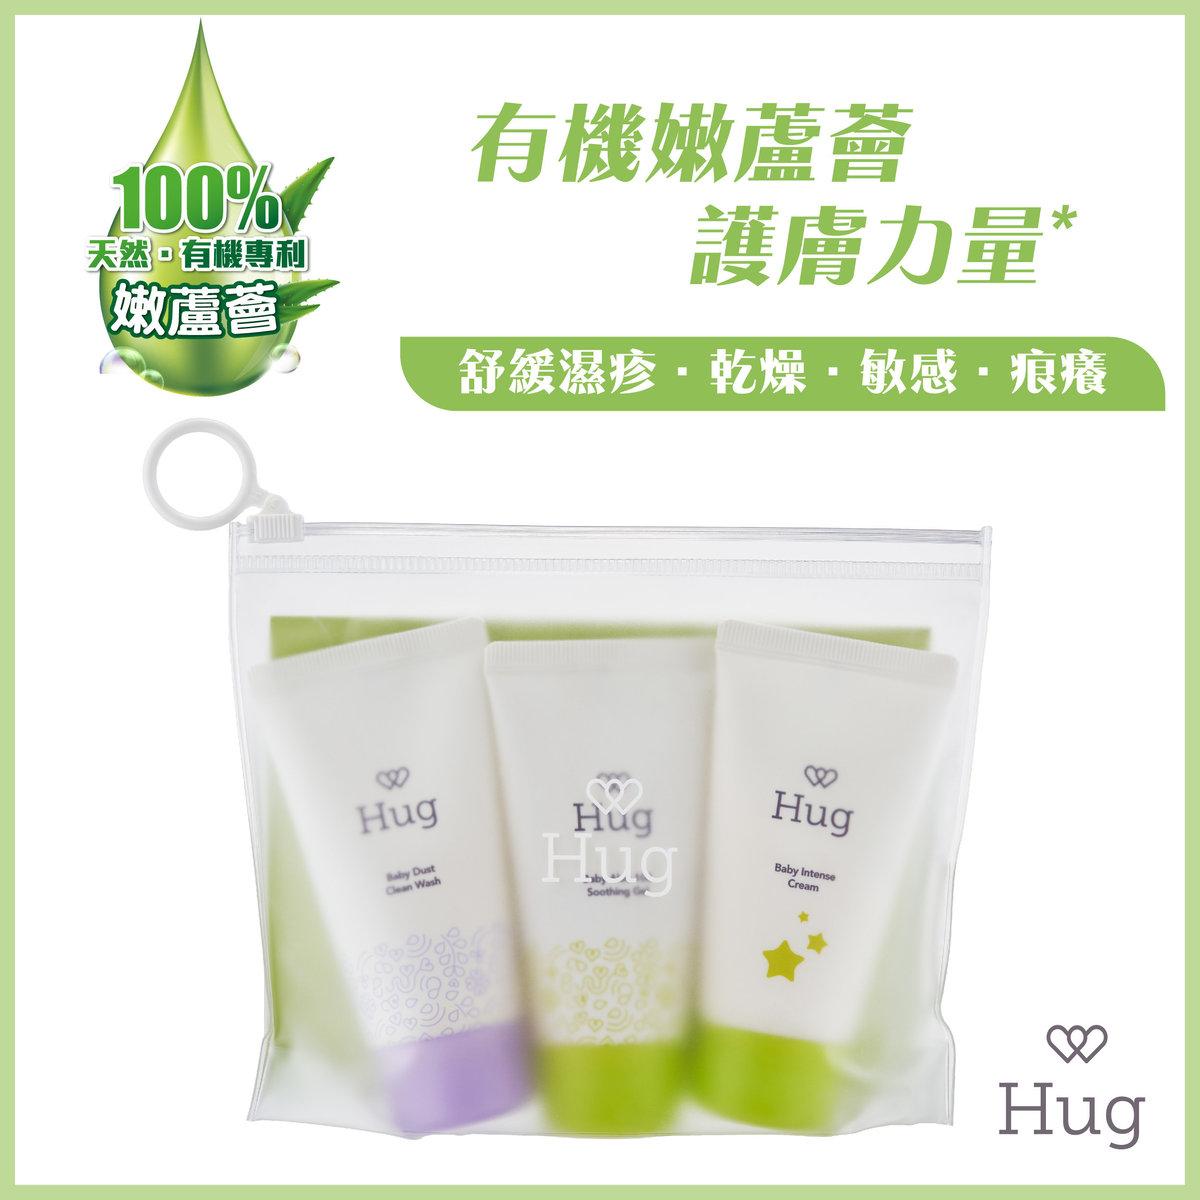 Hug 嬰兒有機嫩蘆薈旅行裝 (40ml X 3)